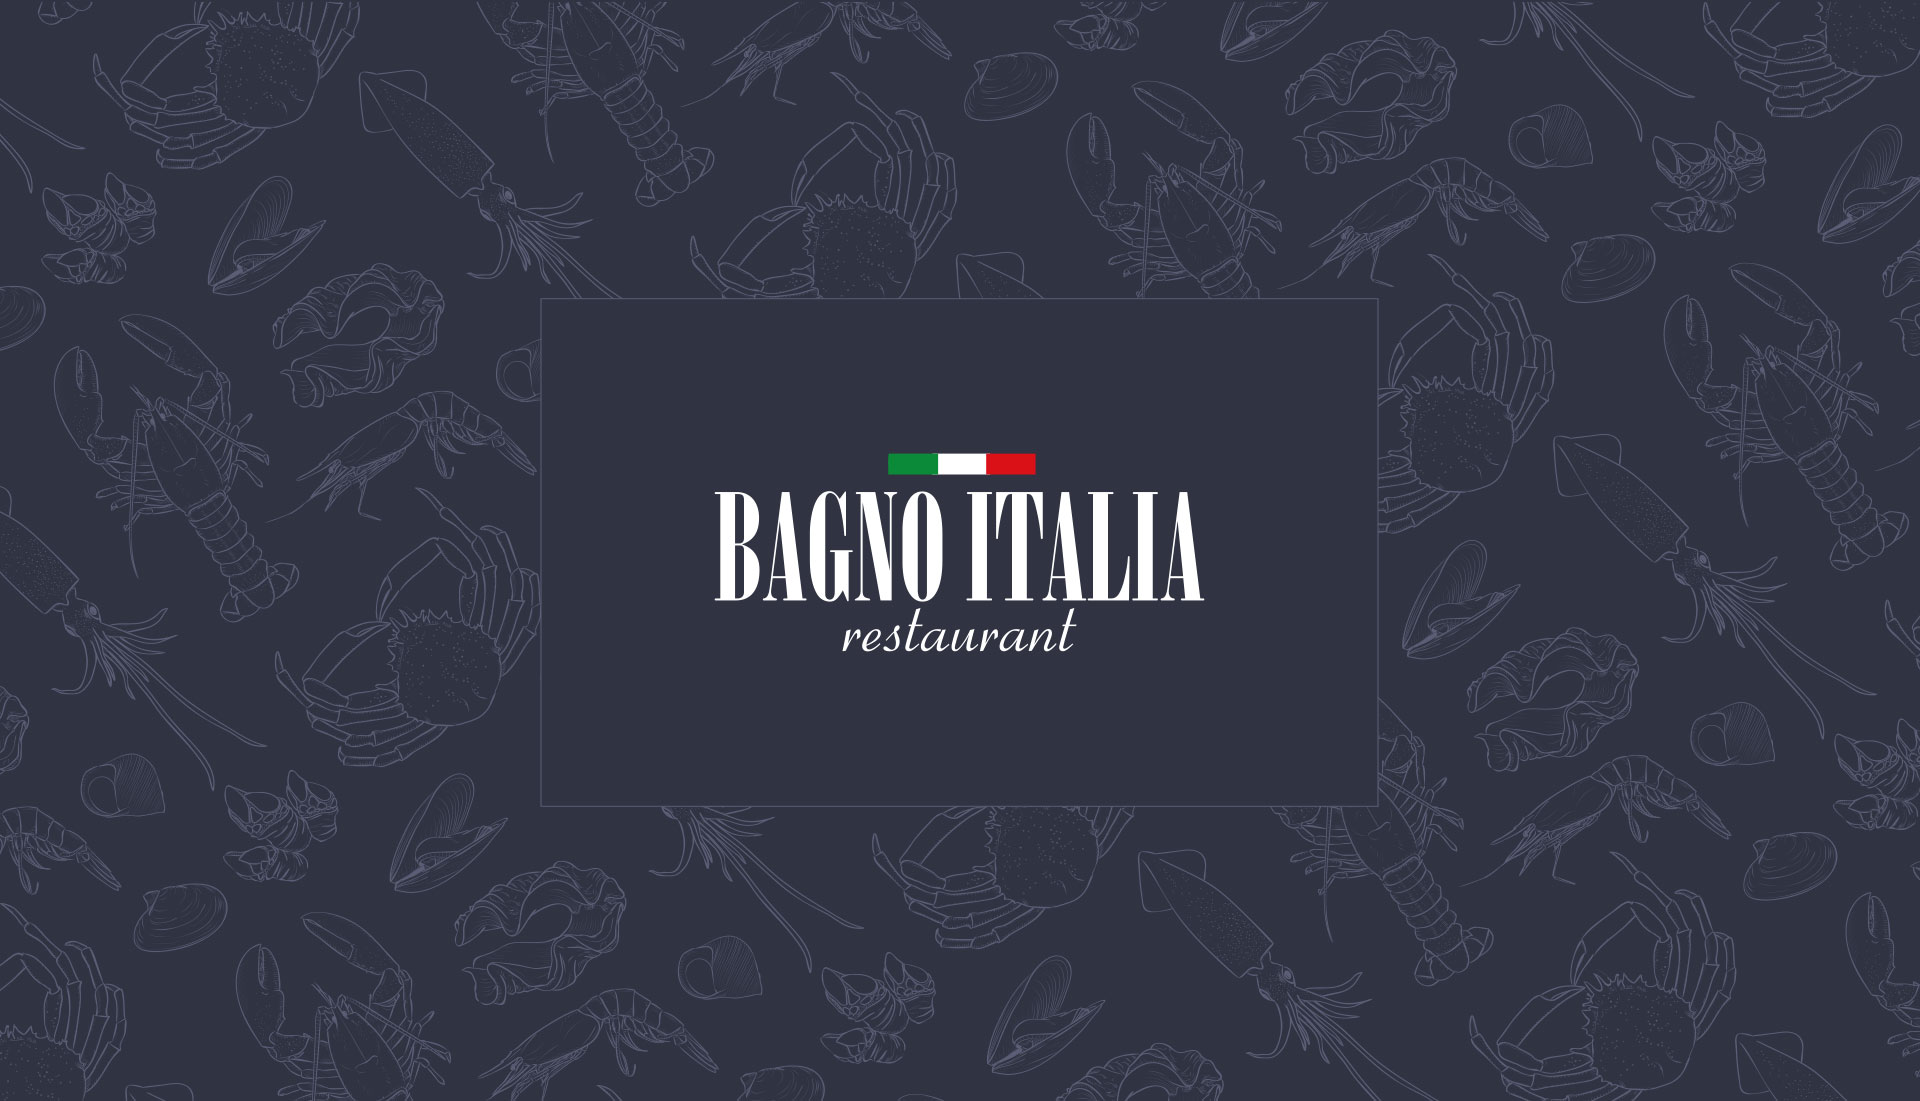 Bagno-Italia-logo